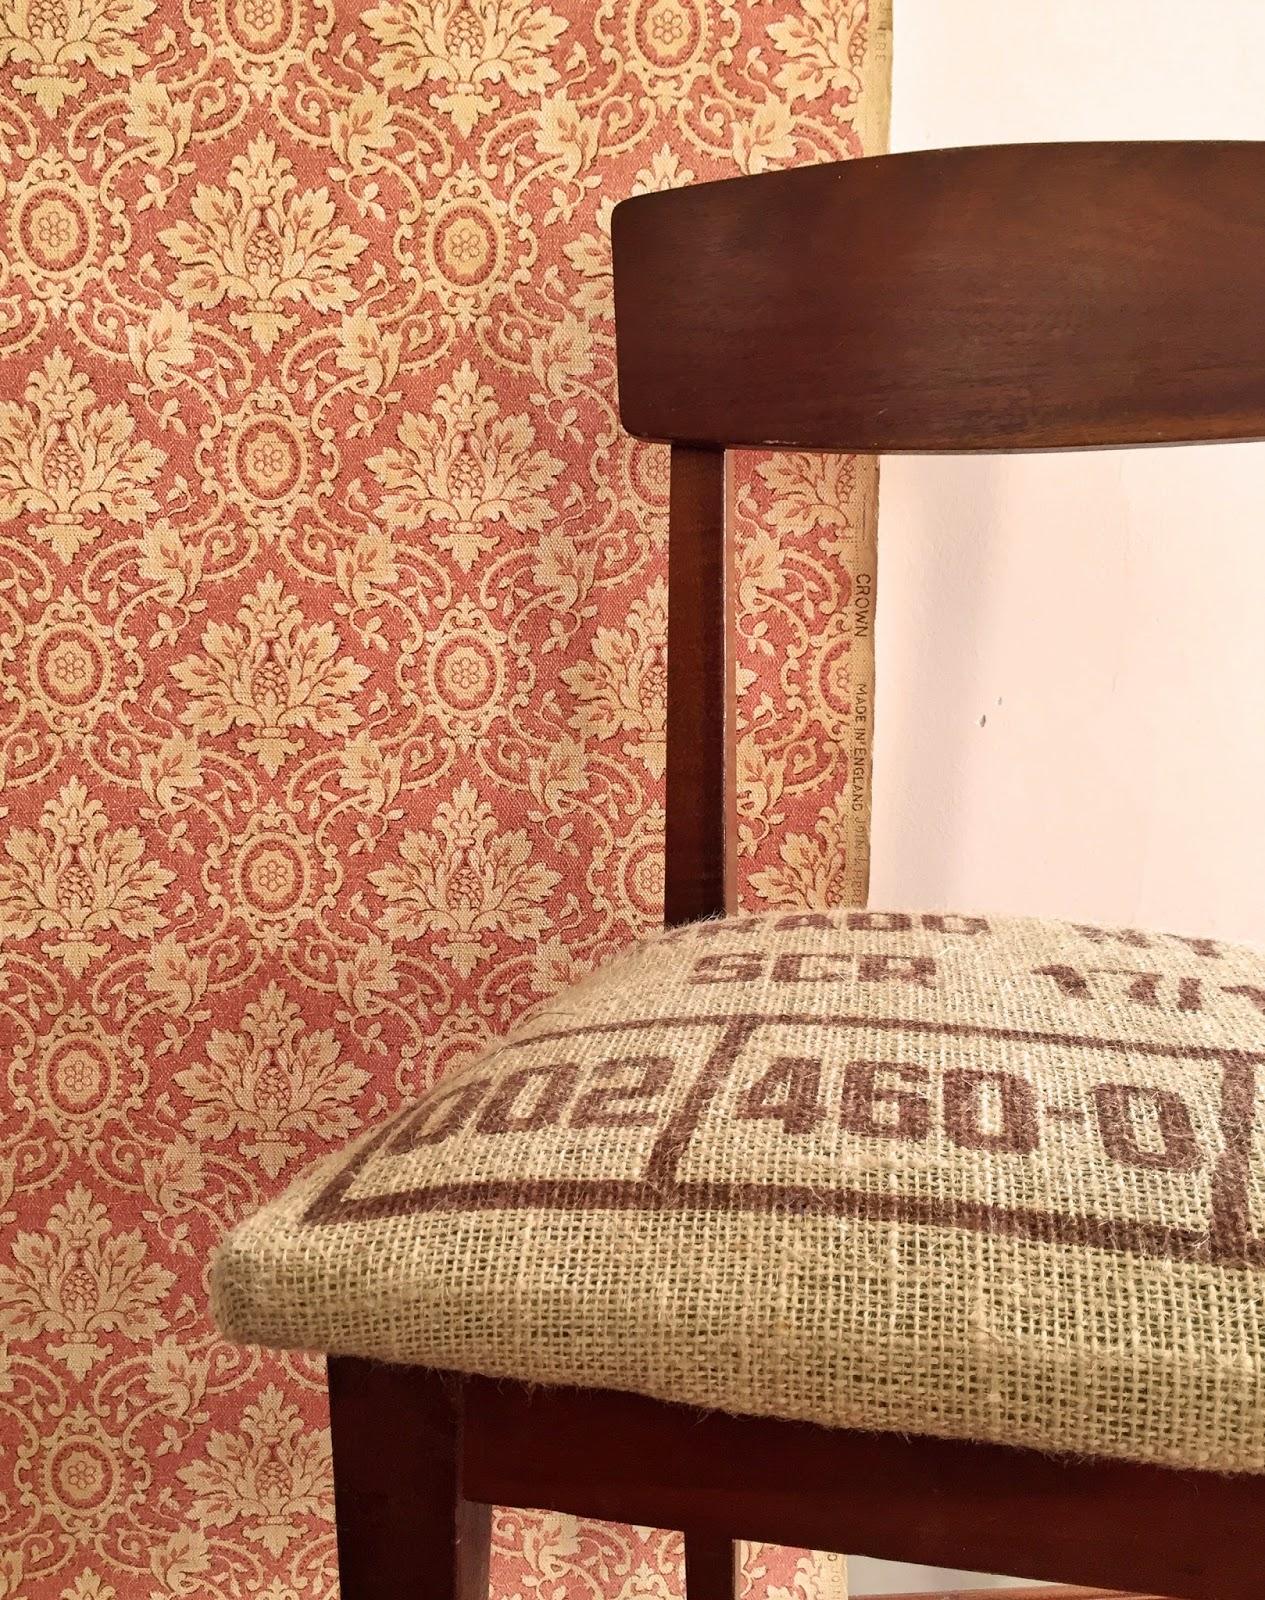 cadeira, vintage, upcycle, decoração vintage, loja vintage